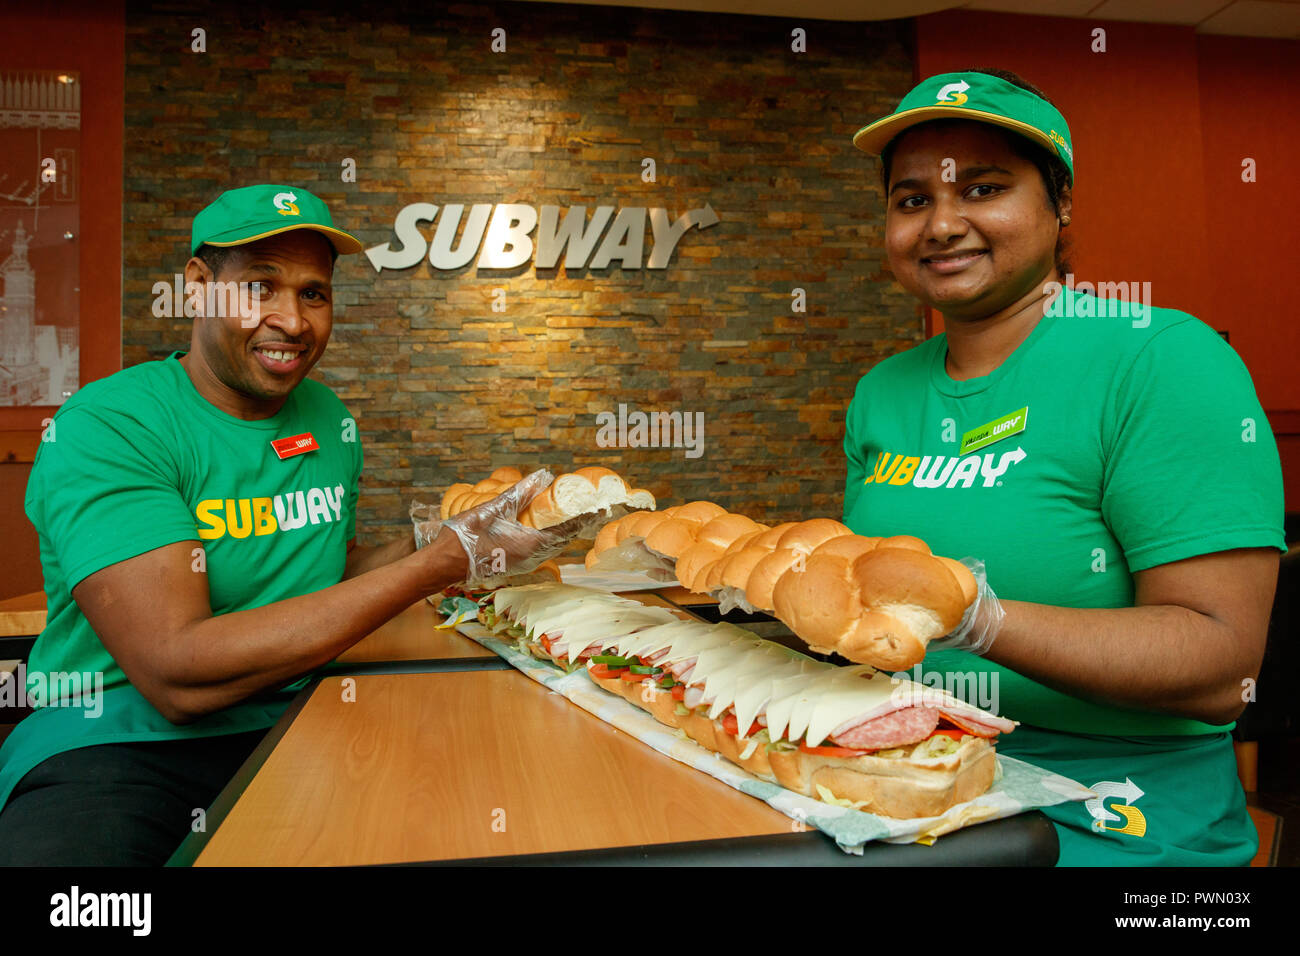 5c6dab6e36b94 Subway Sandwich Artists Justin Pringle and Yasoda Jayaweera make a BMT  Giant Sub for the wedding ...